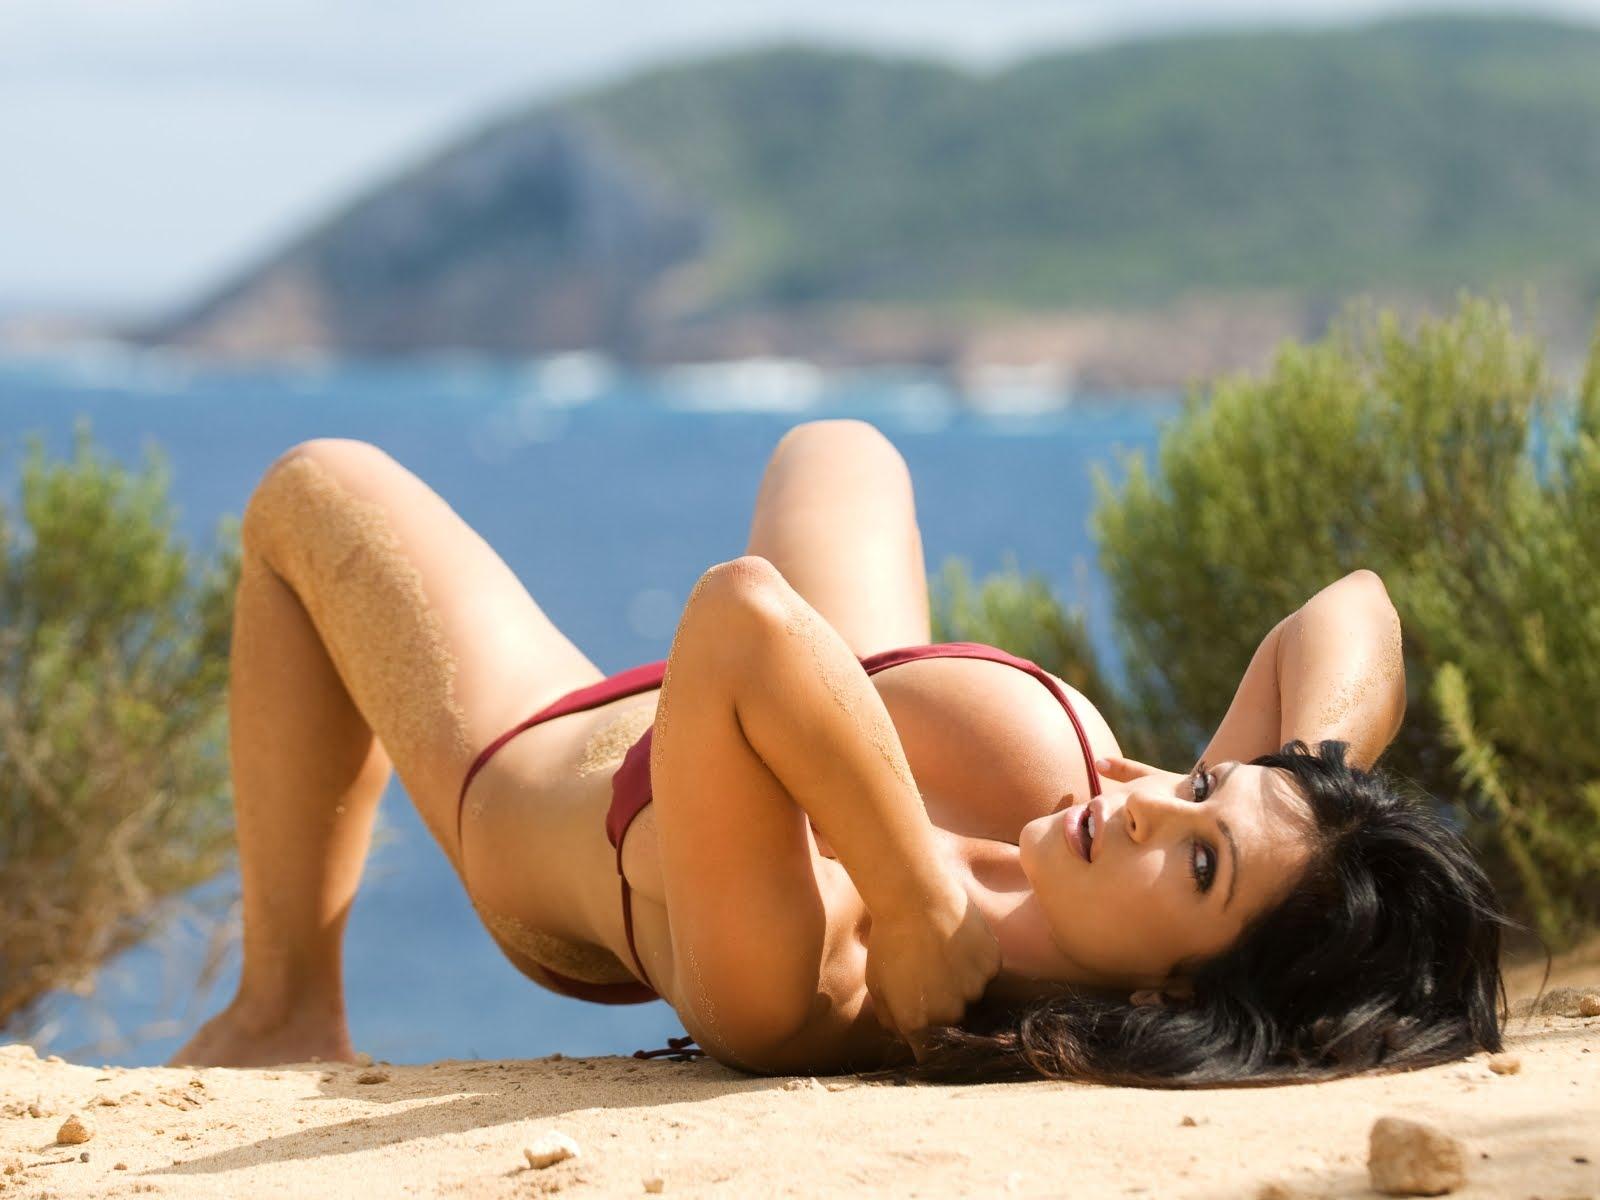 Preview: Red Hot Bikini Wallpaper